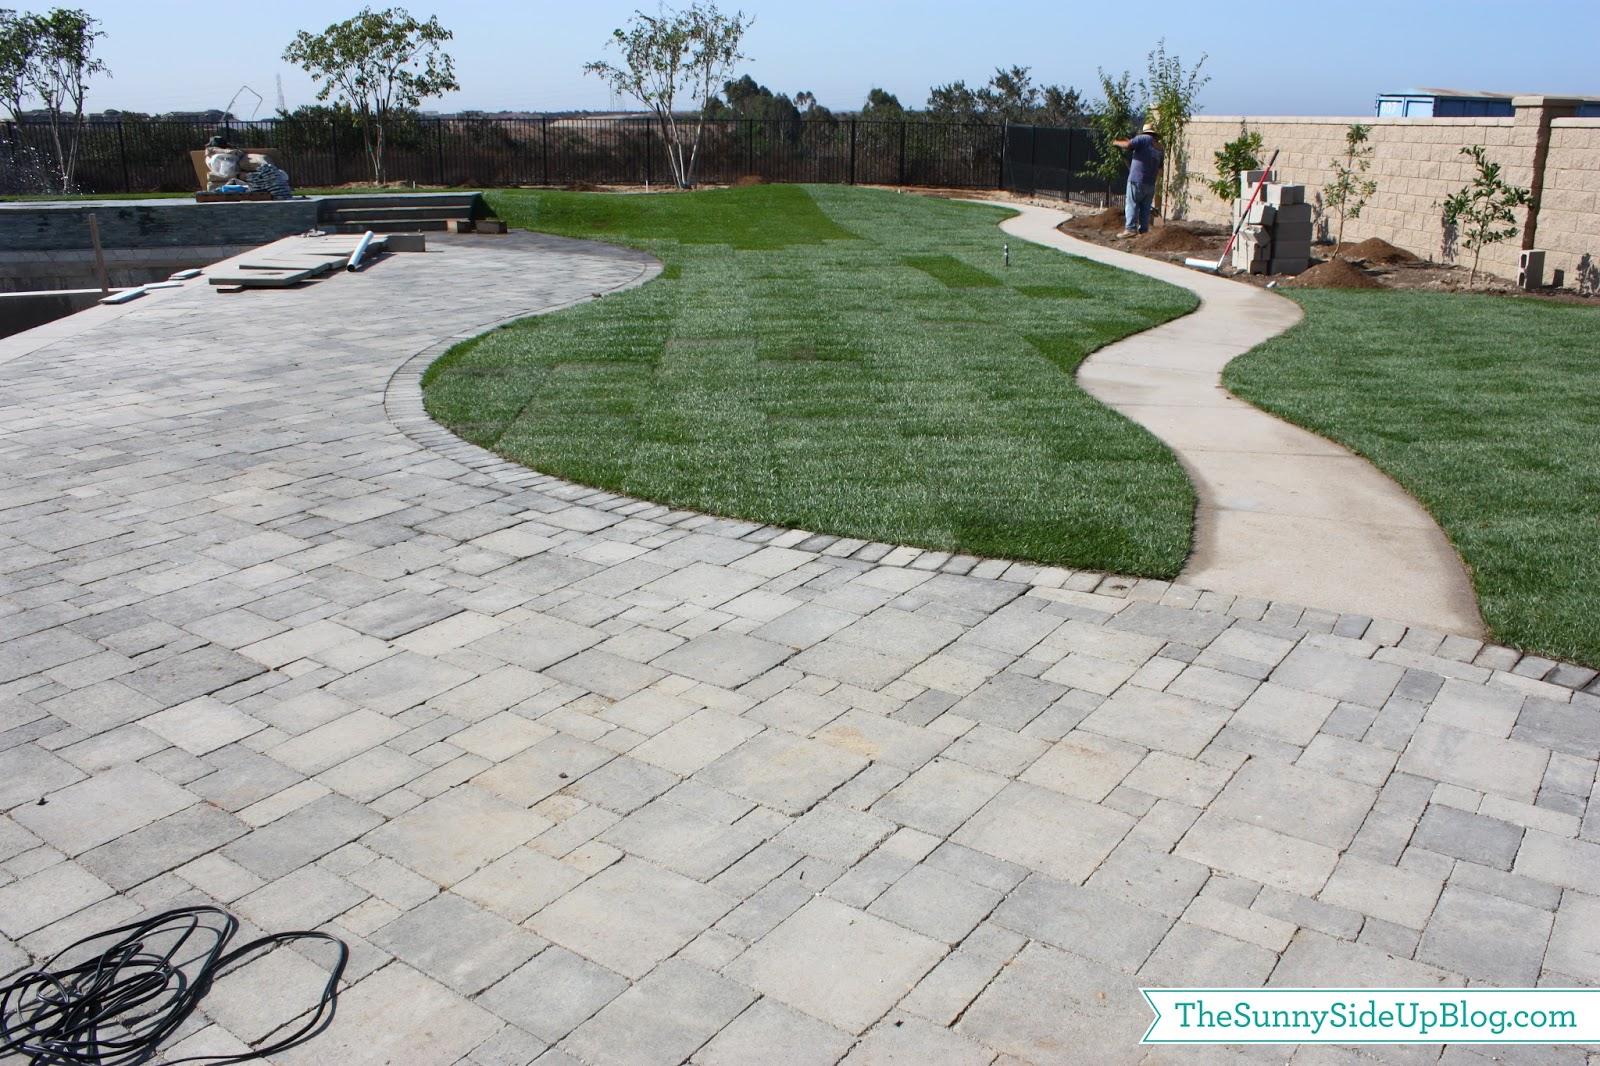 Backyard grass! - The Sunny Side Up Blog